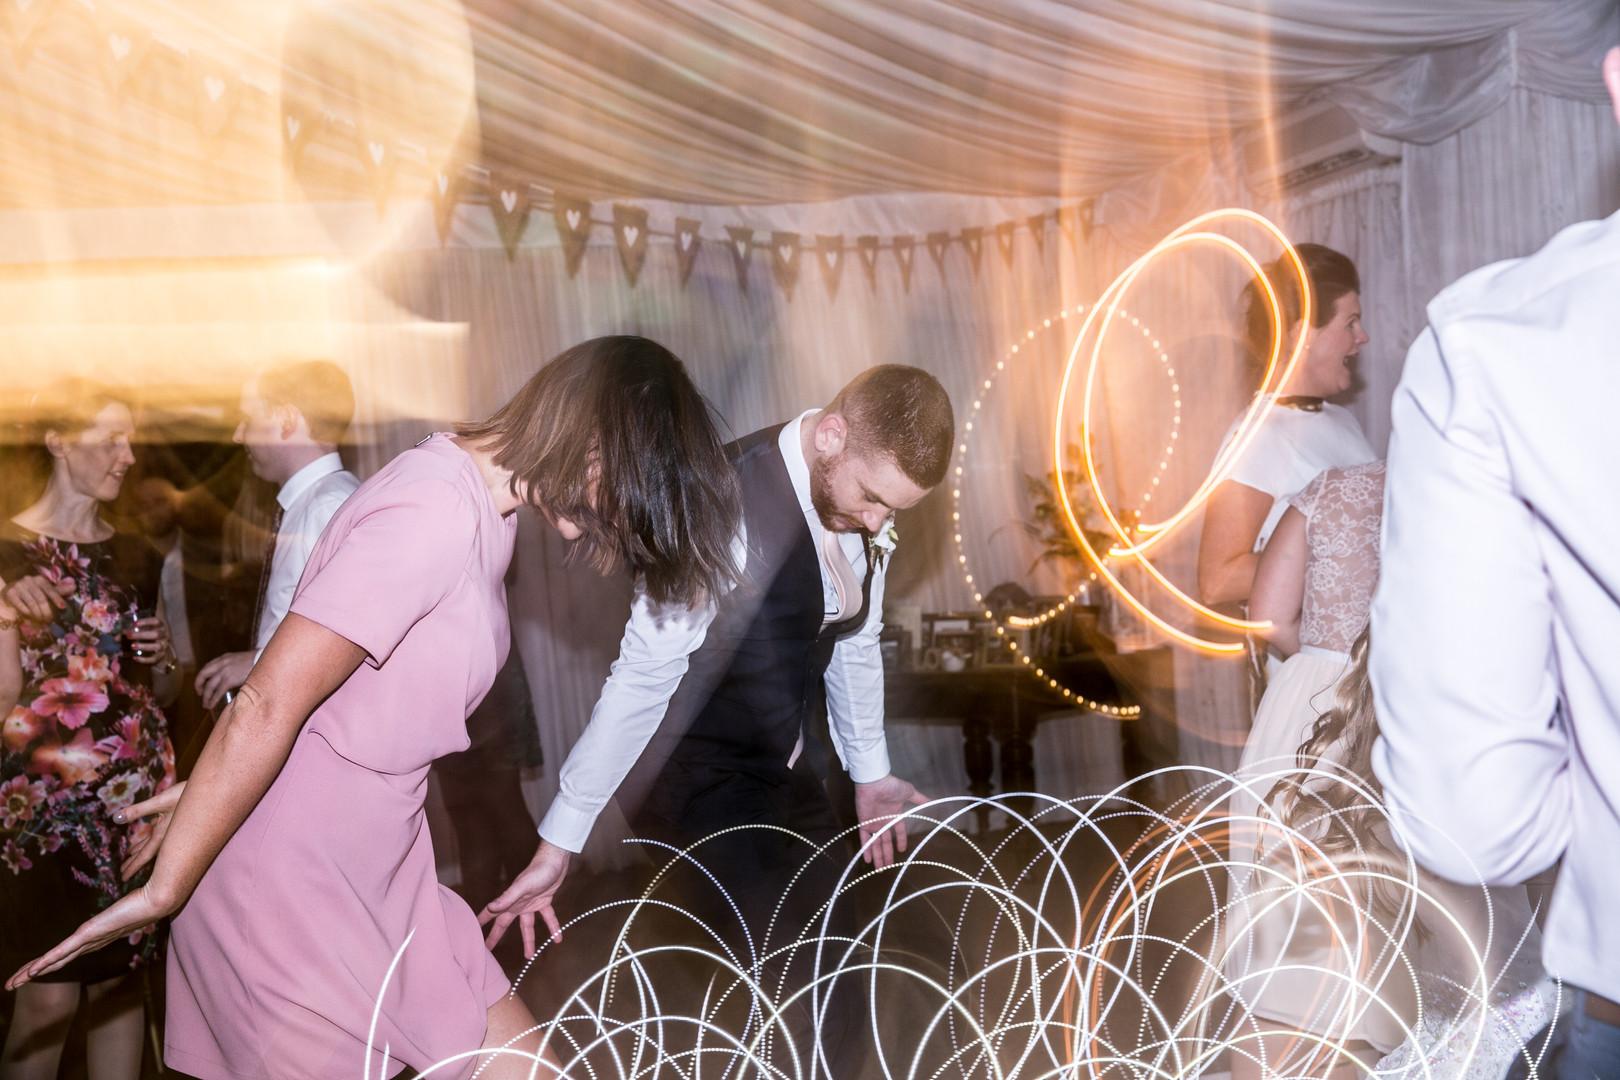 Dance, long exposure